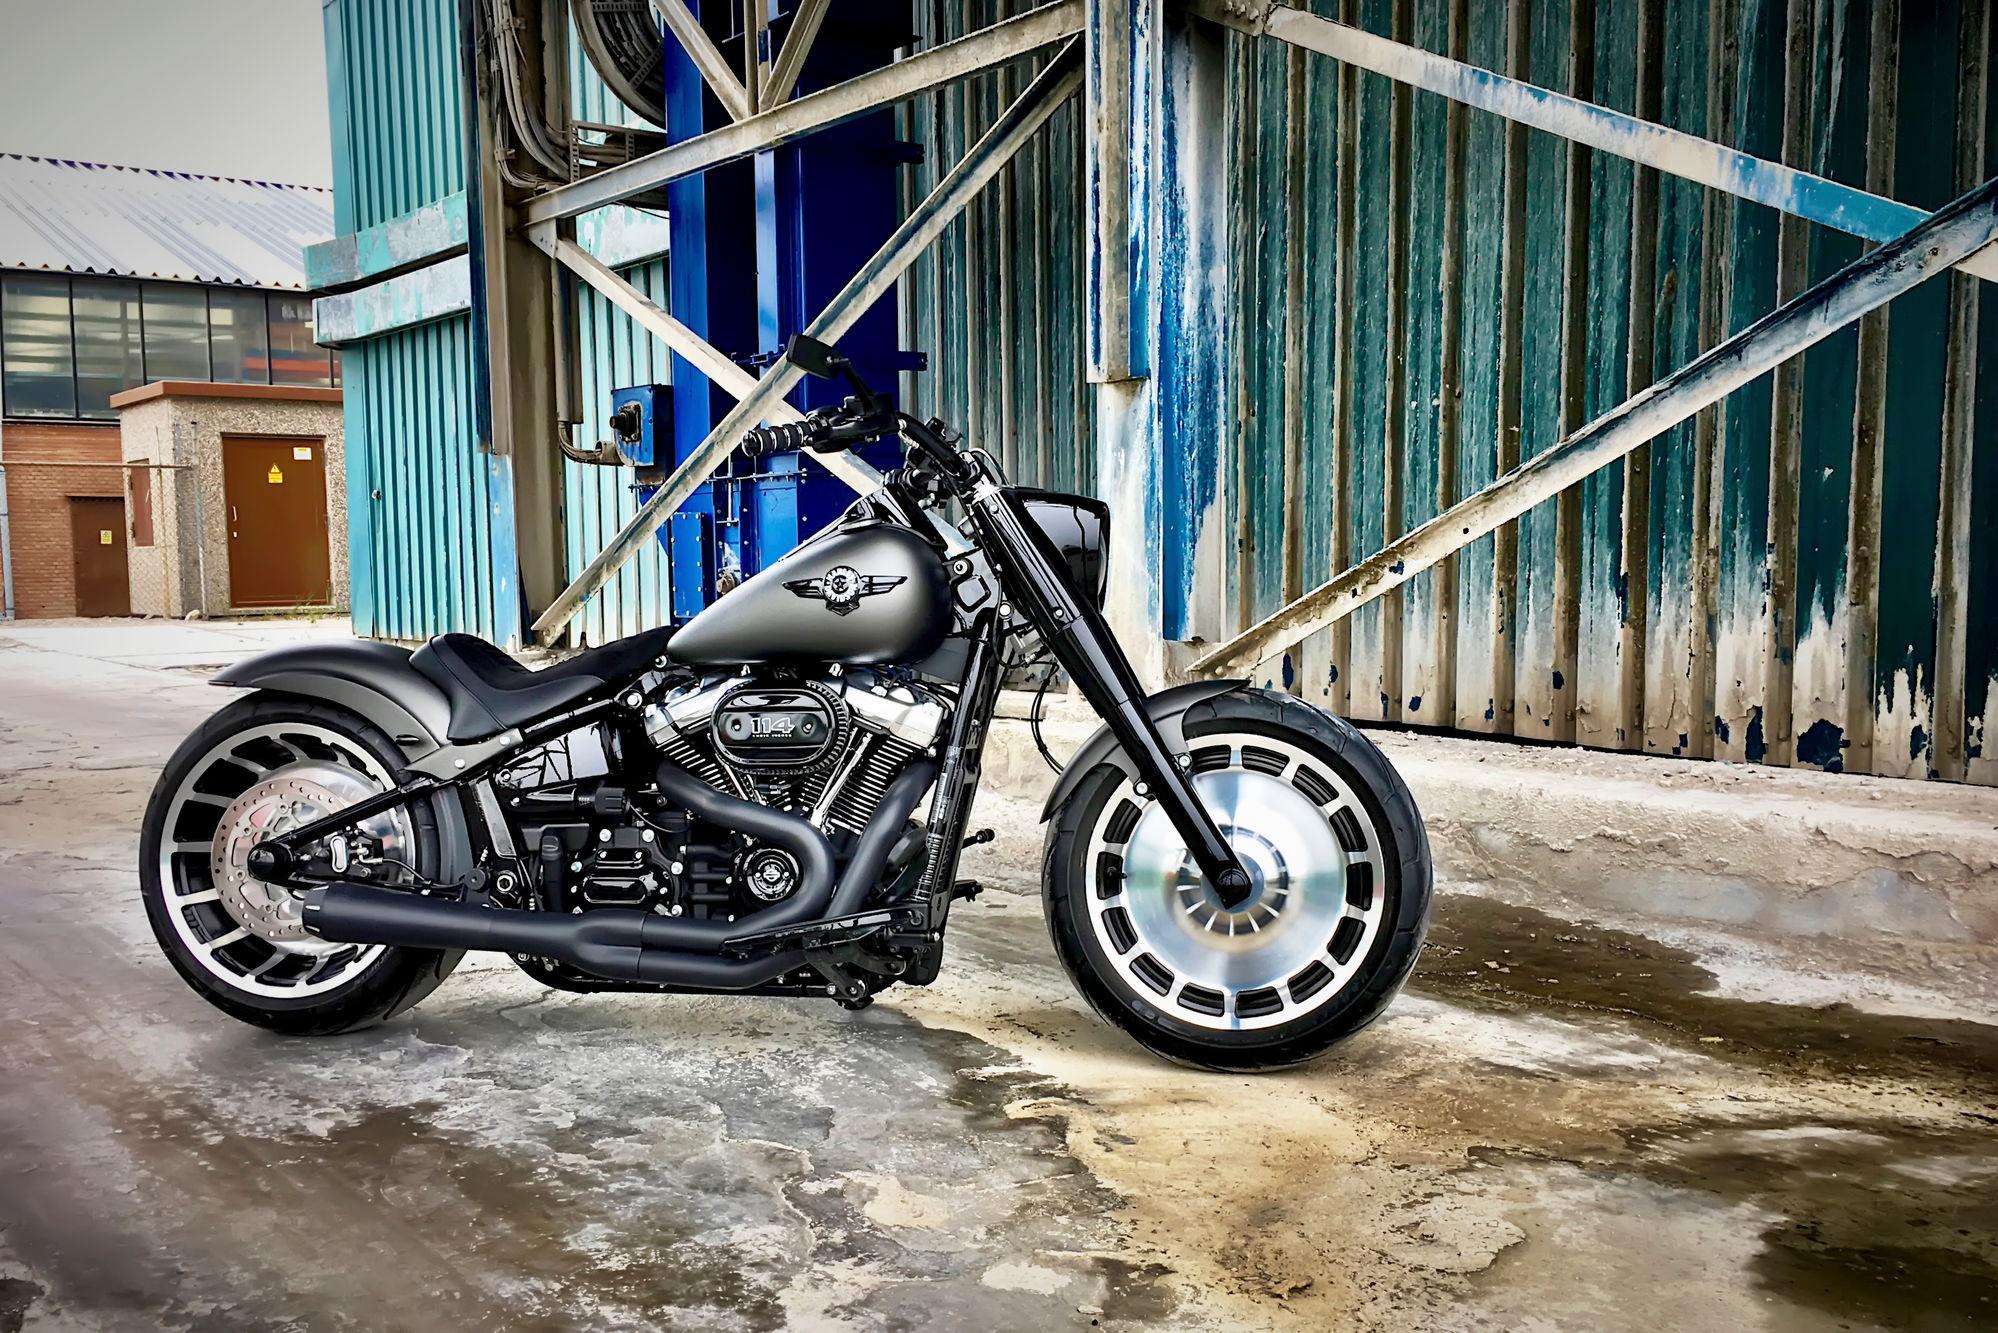 2018 Custom Red Fat Boy S - Page 4 - Harley Davidson Forums